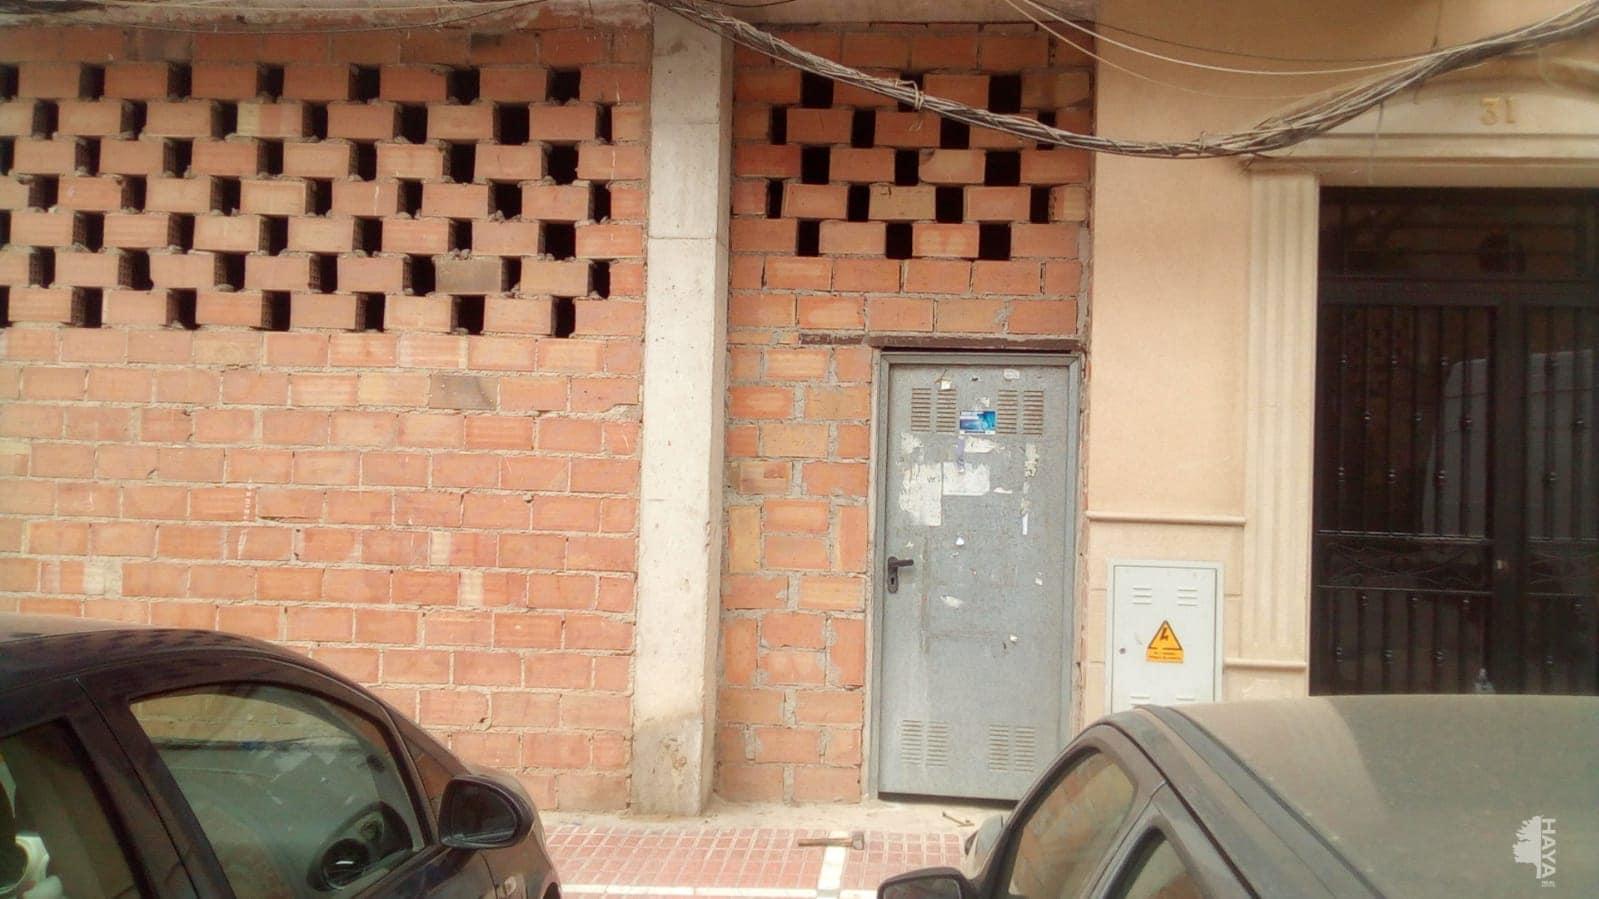 Local en venta en Jódar, Jaén, Calle Domingo Arroquia, 215.699 €, 202 m2